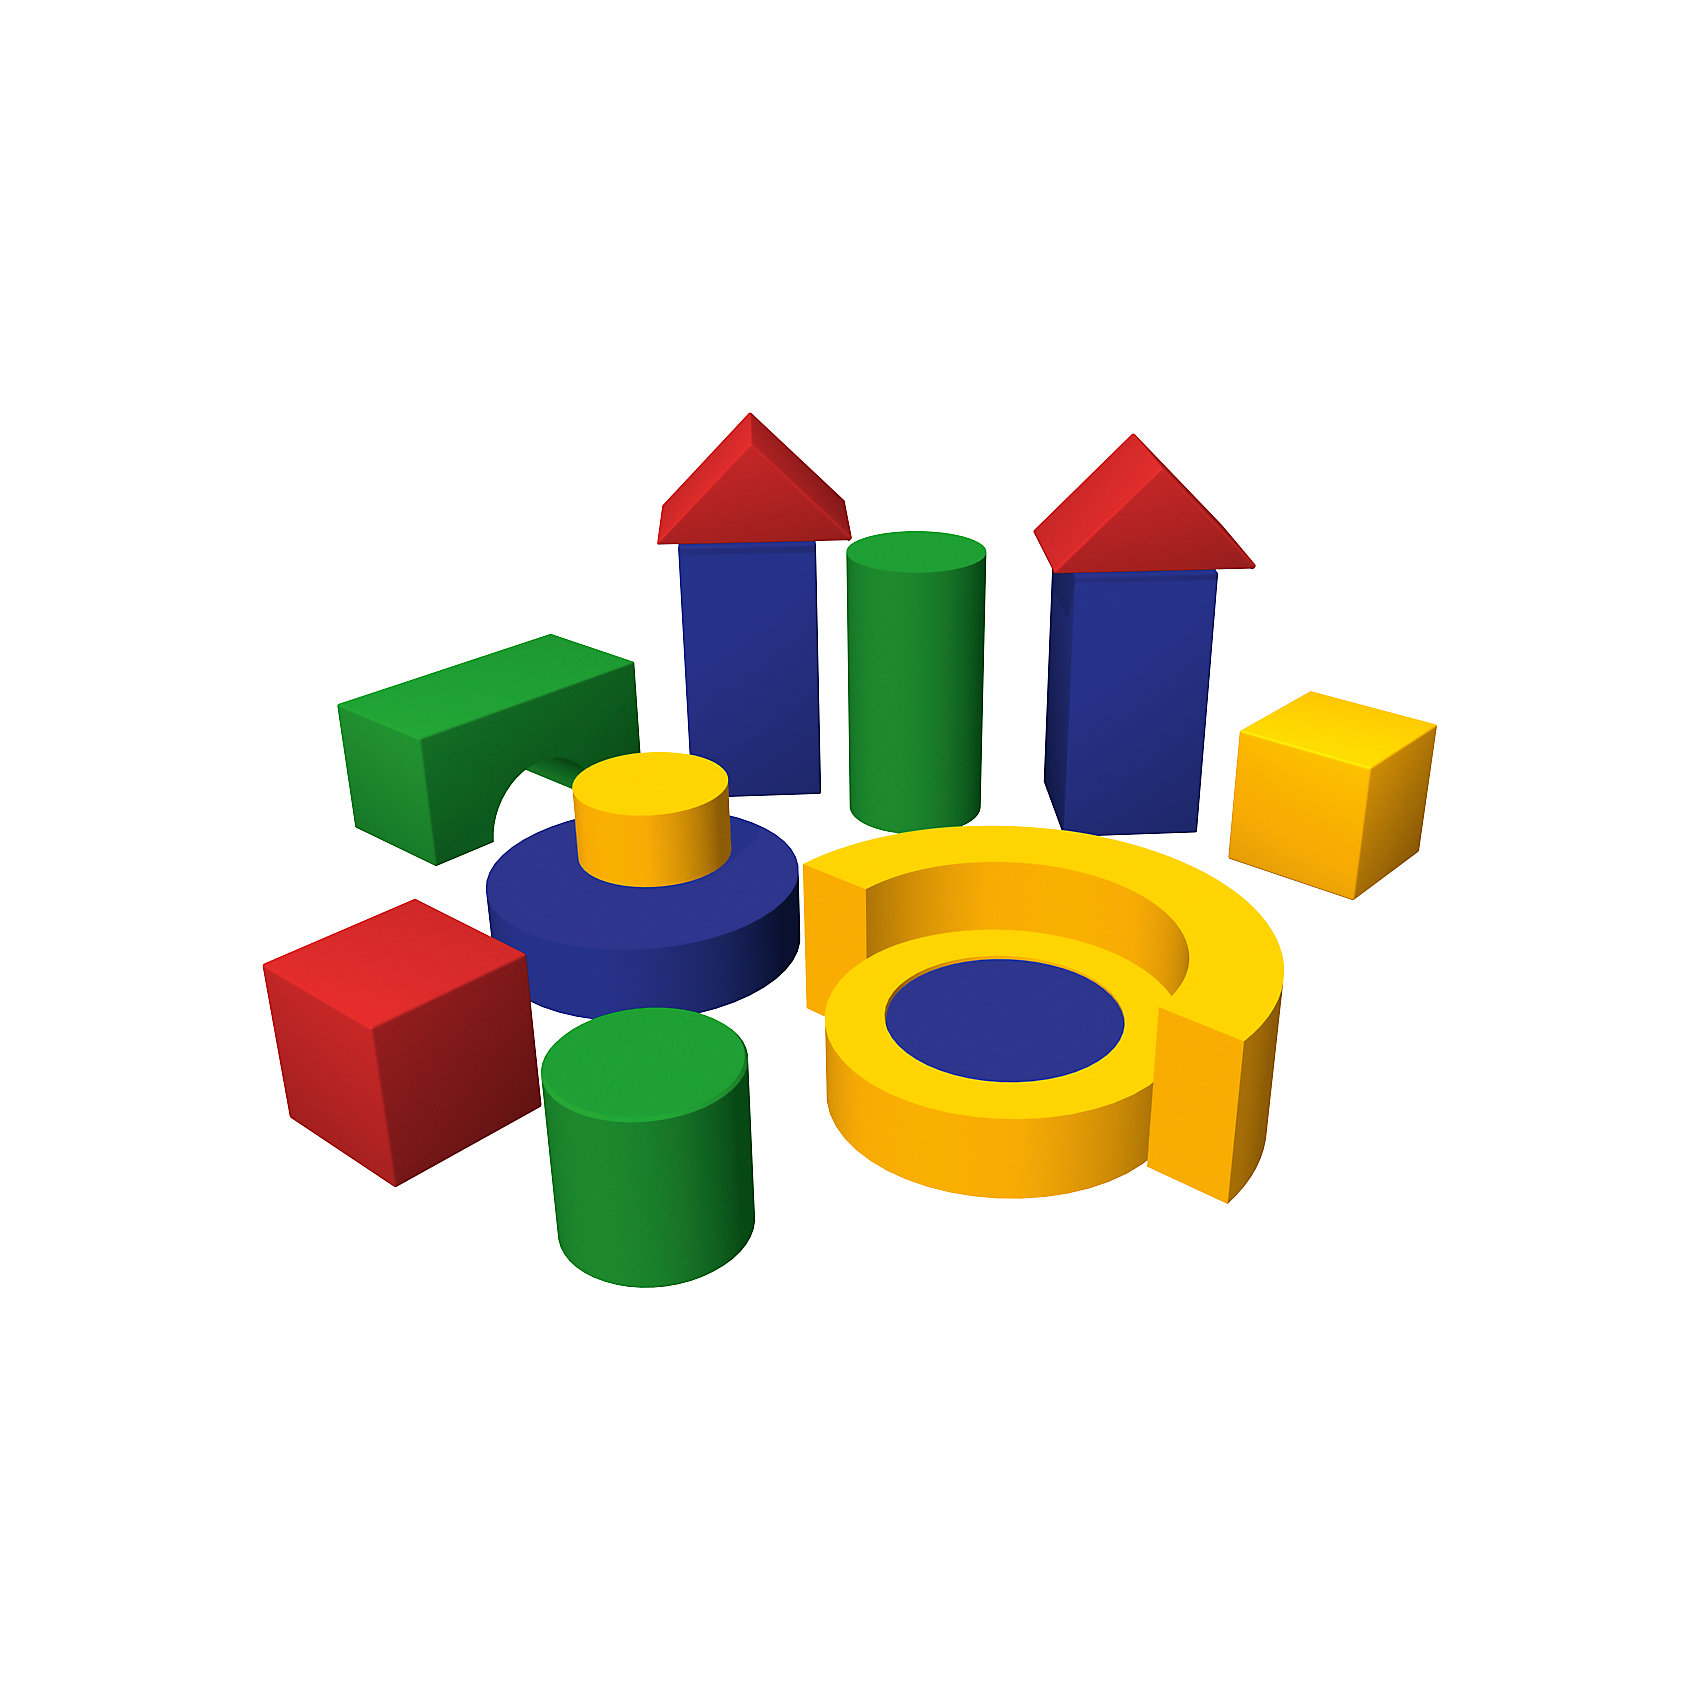 ROMANA Игровой модуль Избушка, ROMANA мягкие модули romana мягкий конструктор теремок мини